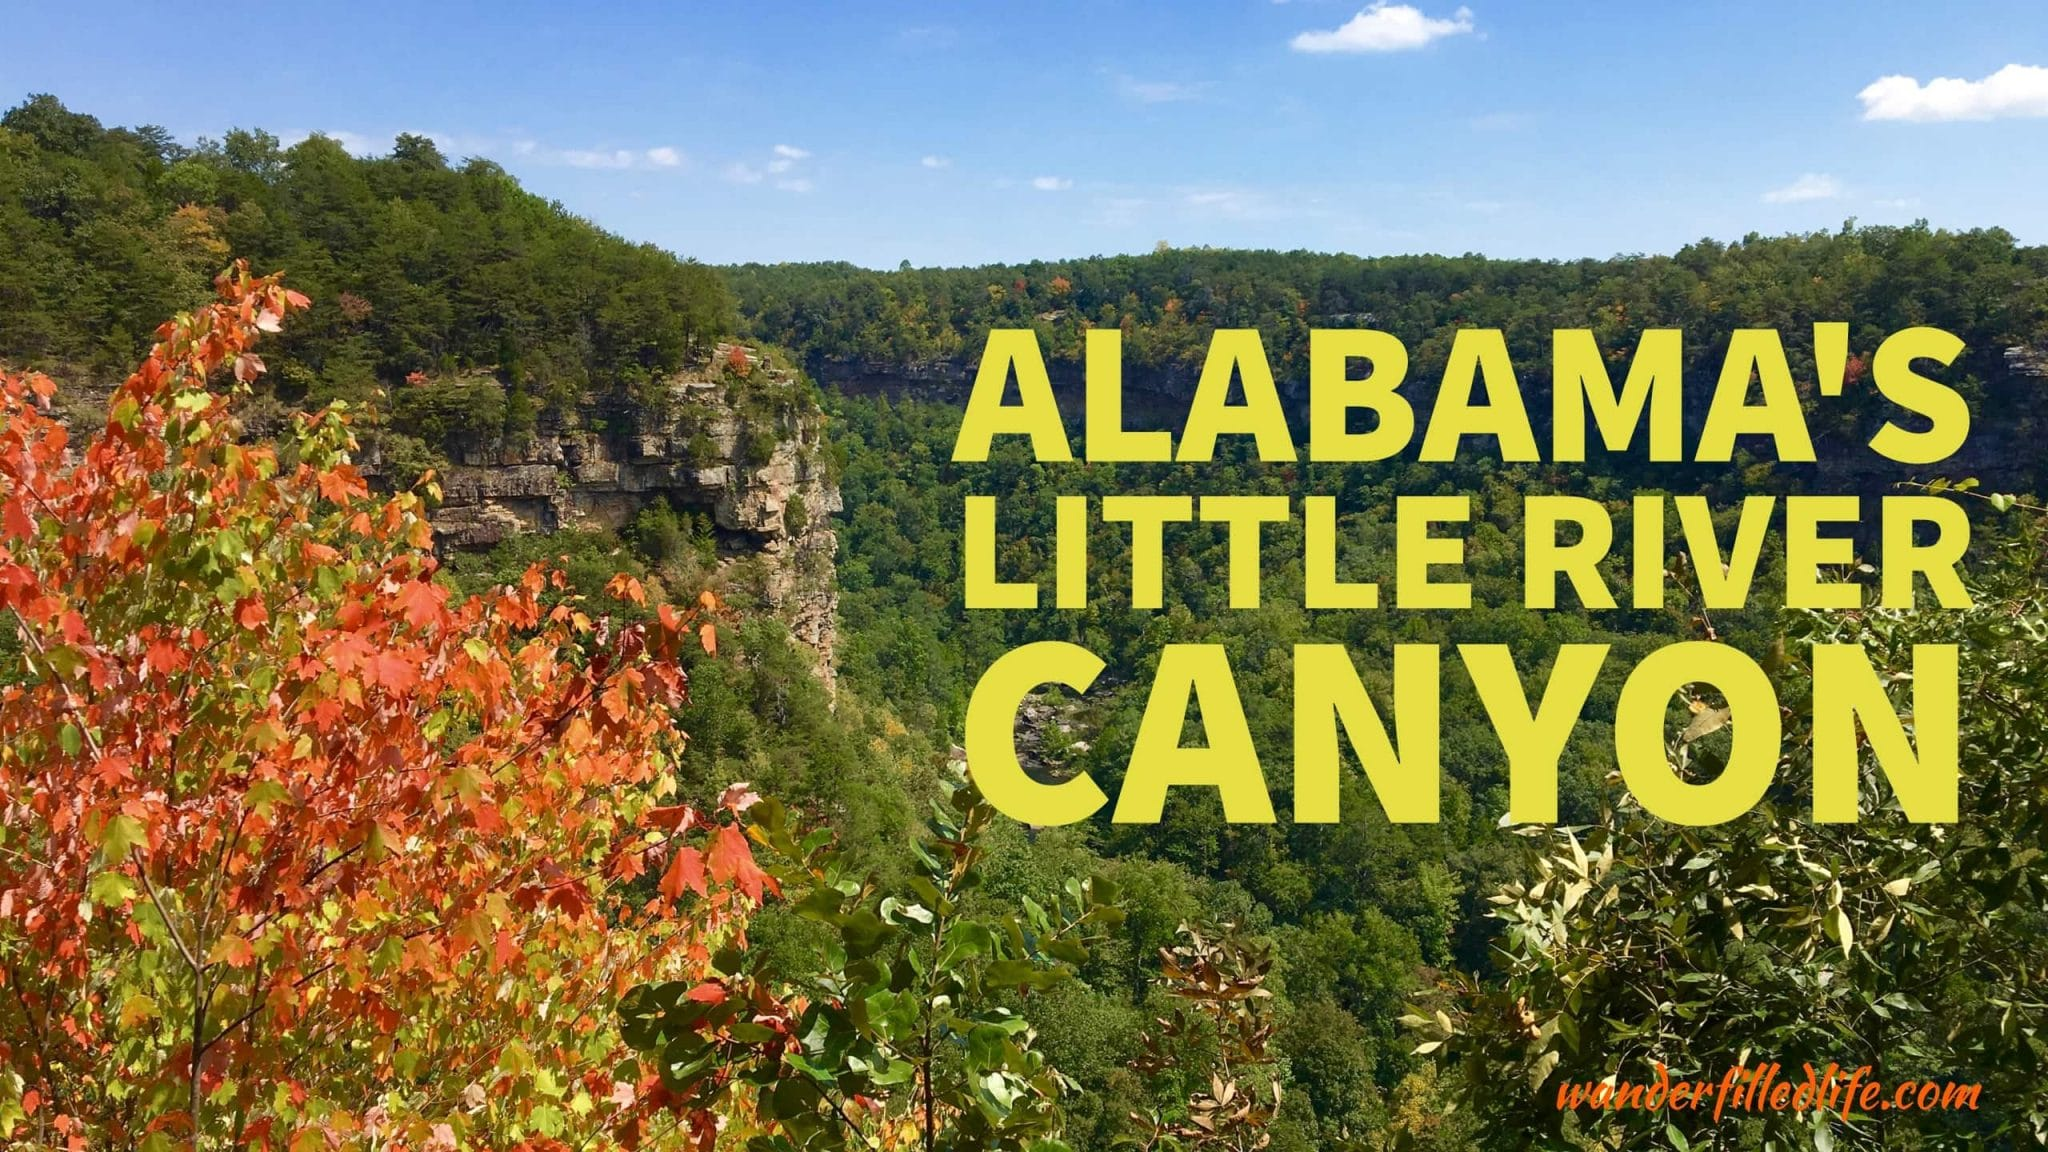 Alabama's Little River Canyon